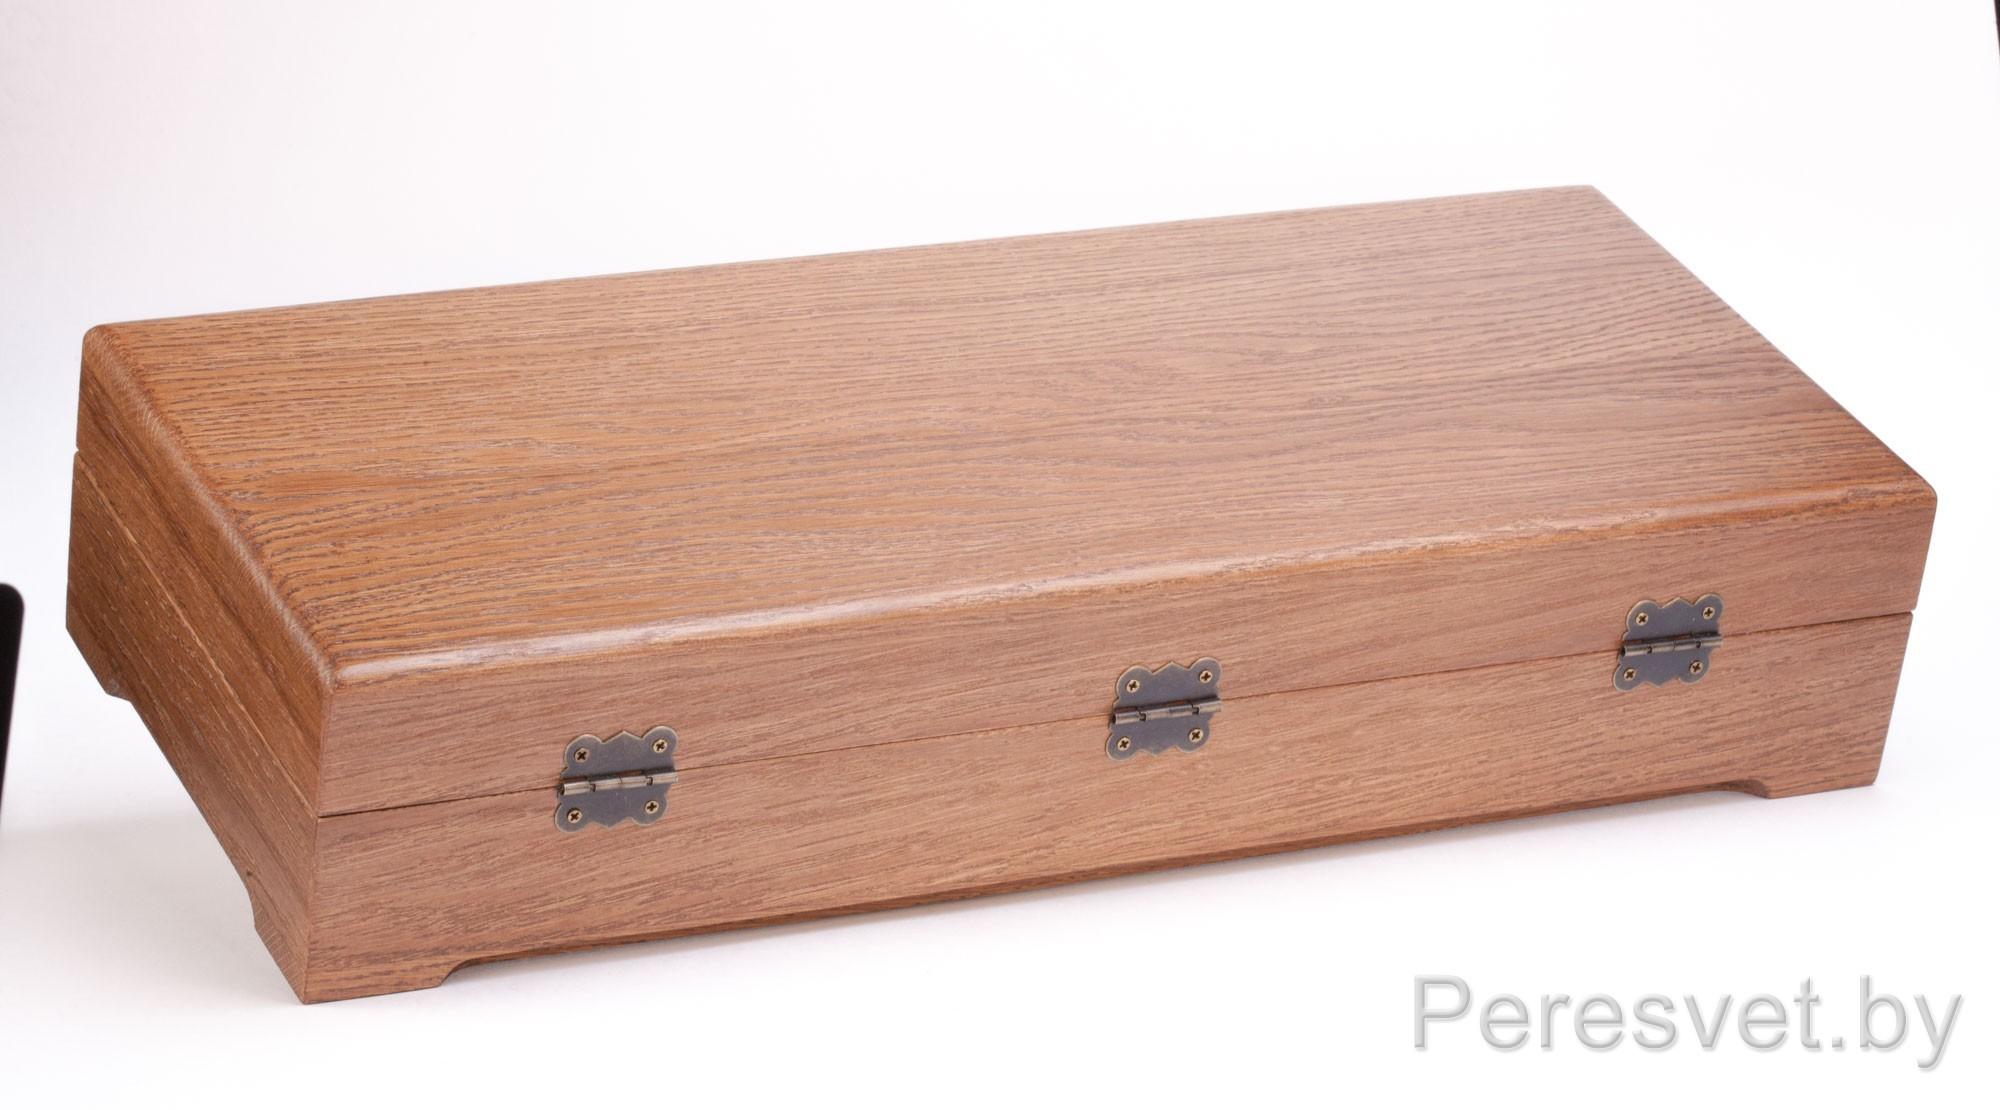 Рюмки стопки перевертыши подарочный набор Охота бронза на peresvet.by